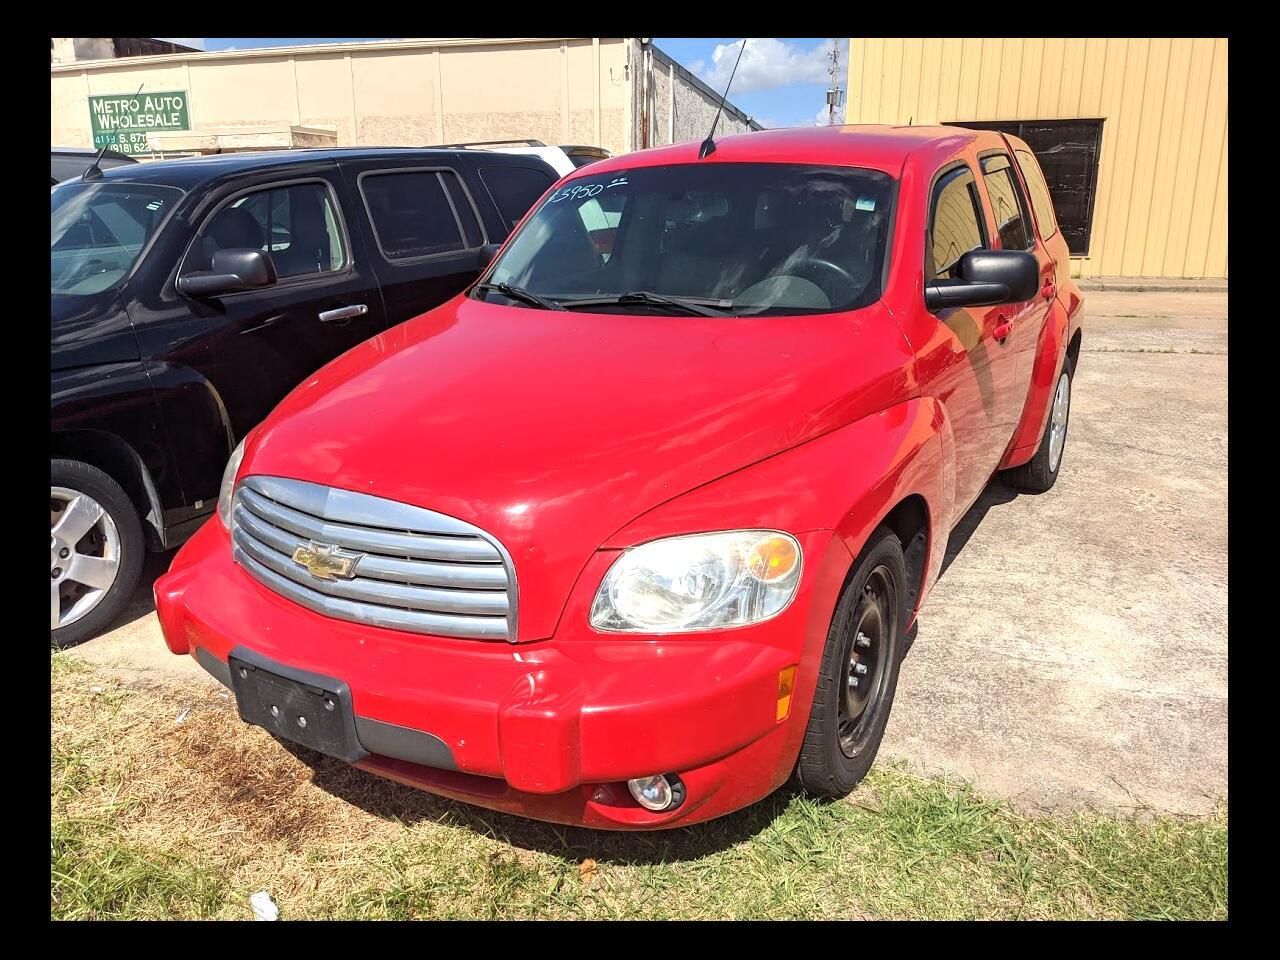 Used 2010 Chevrolet Hhr Ls In Tulsa Ok Auto Com 3gnbaadb1as541583